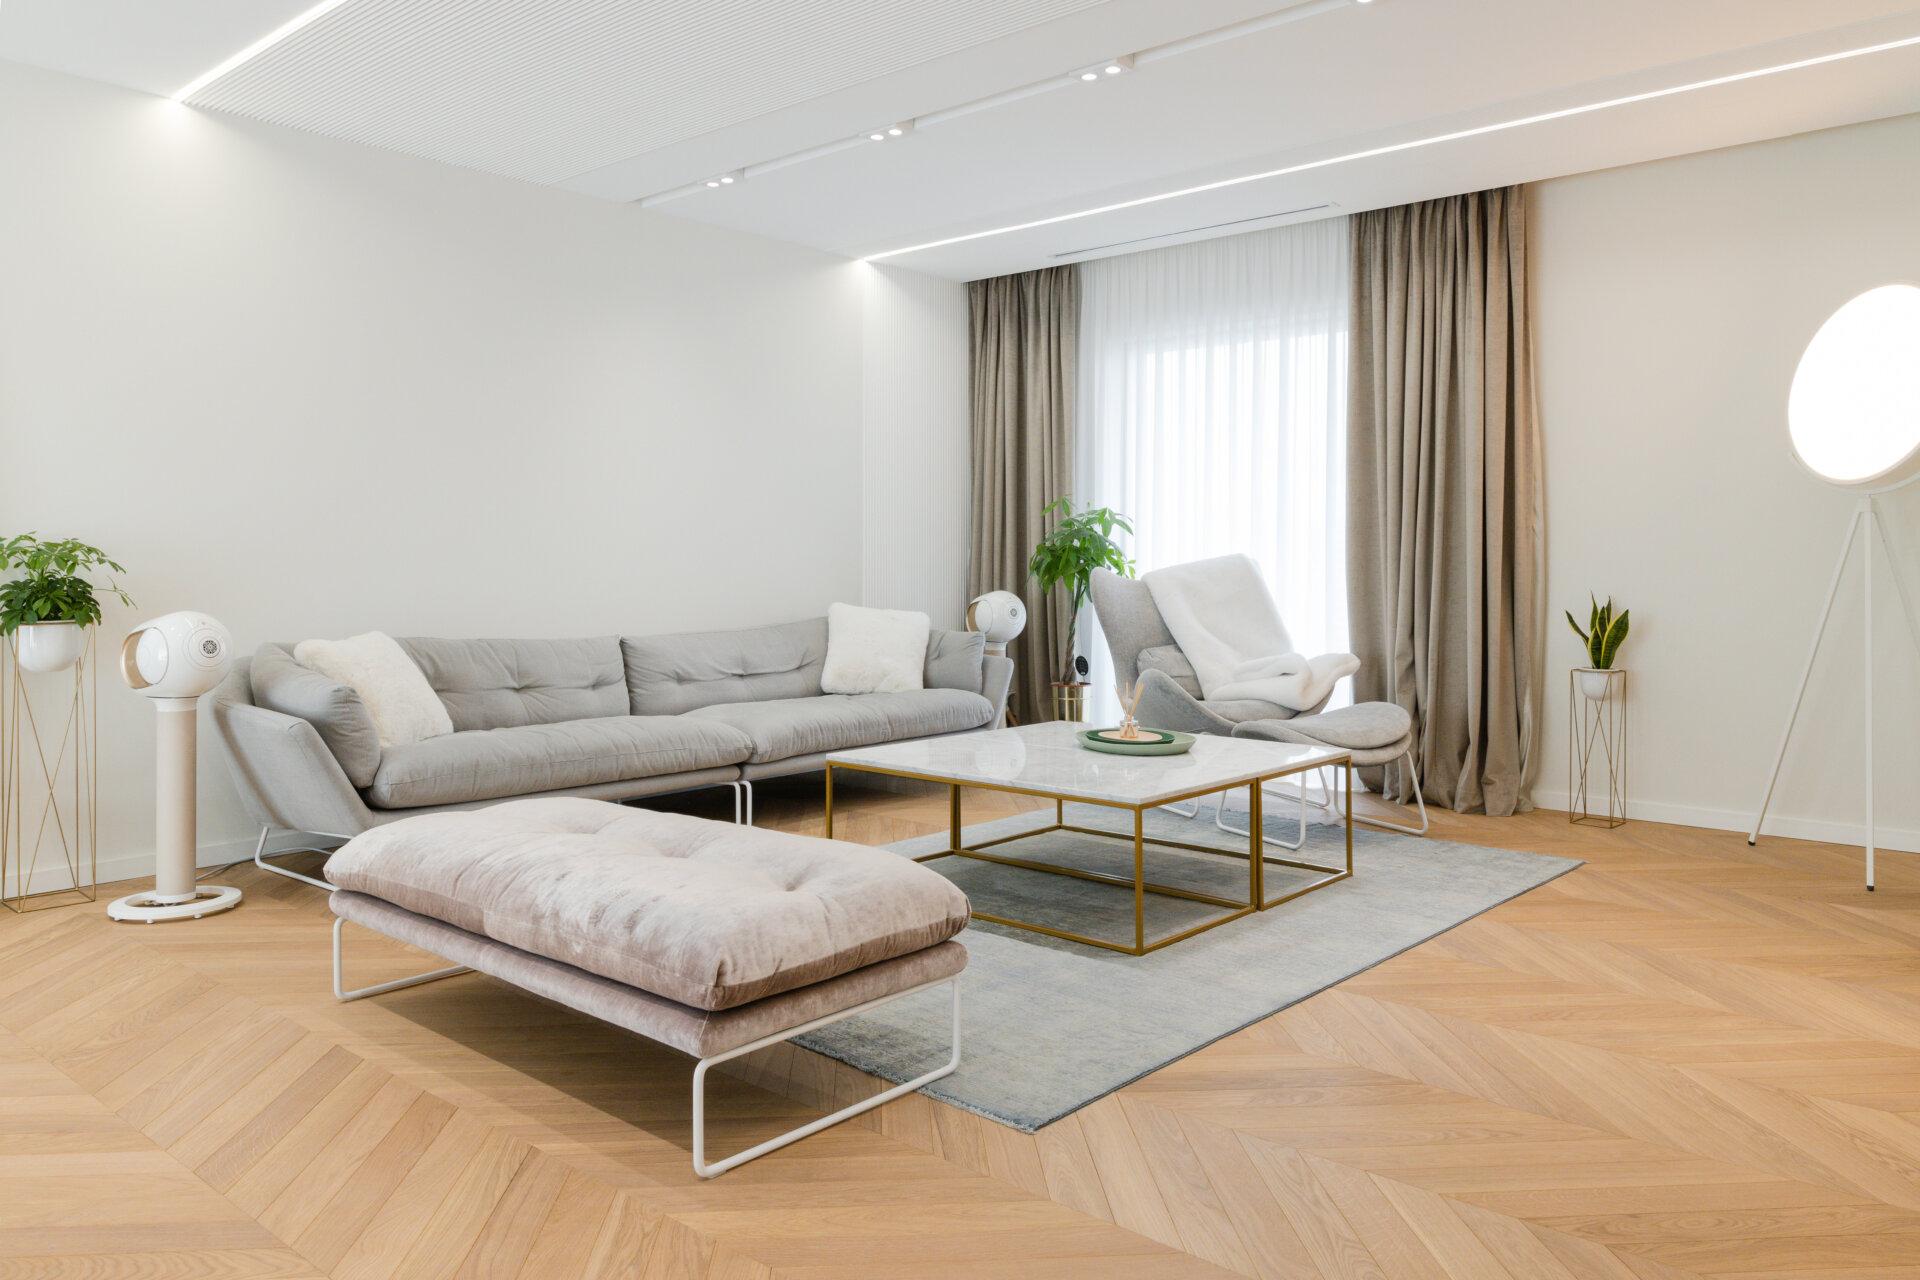 20210303-carpet&more-vila-bogdan-craiova-by-hugmedia-11